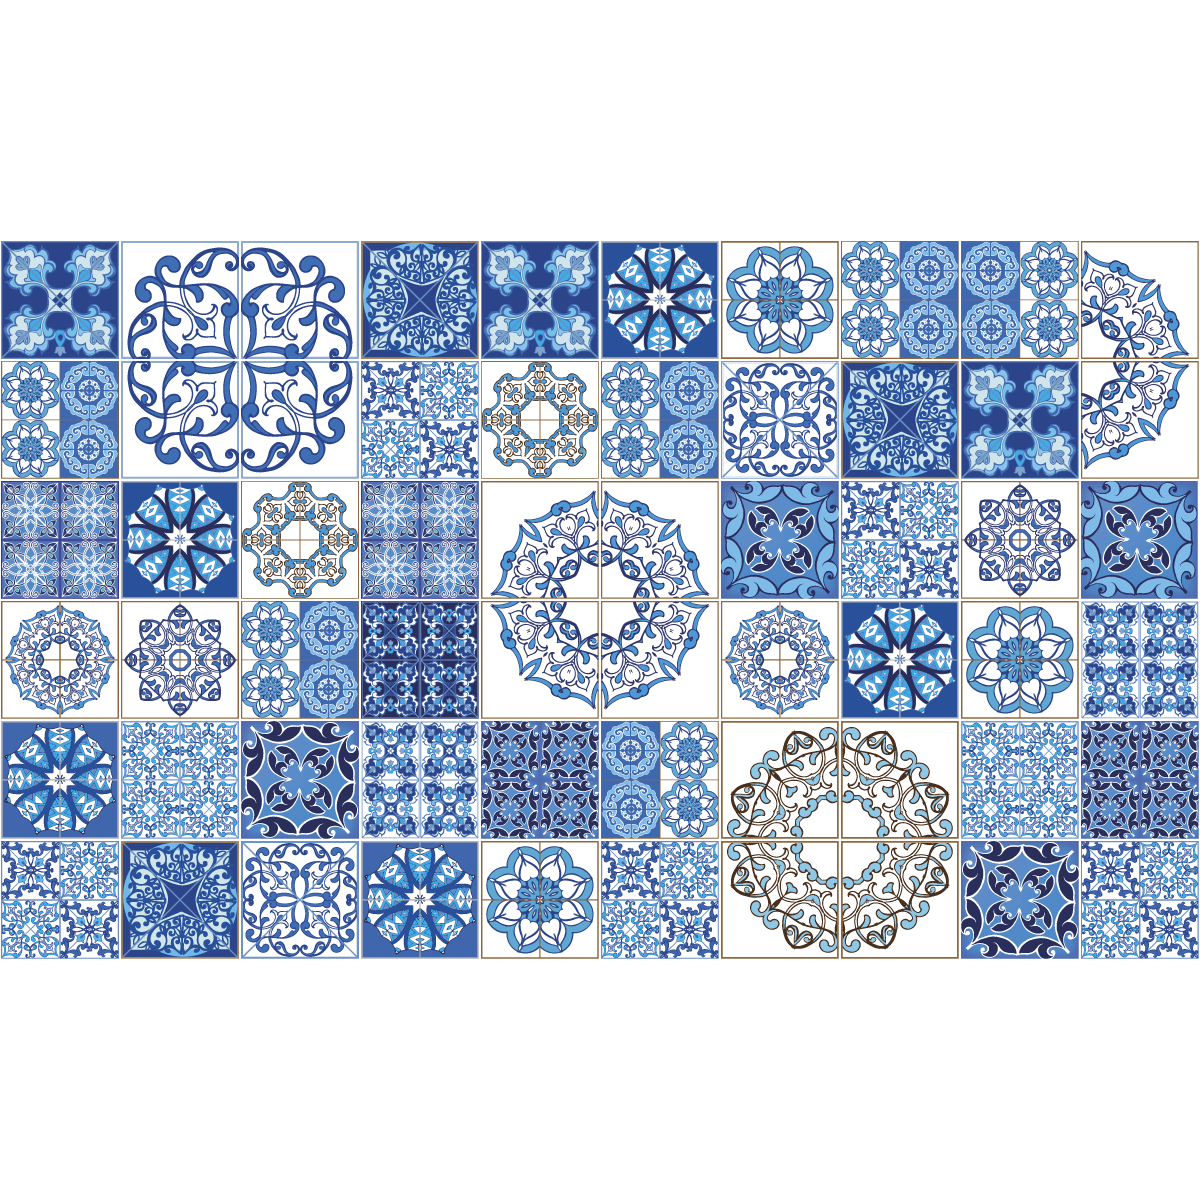 60 stickers carreaux de ciment azulejos serafina salle de bain mur salle de bain ambiance. Black Bedroom Furniture Sets. Home Design Ideas